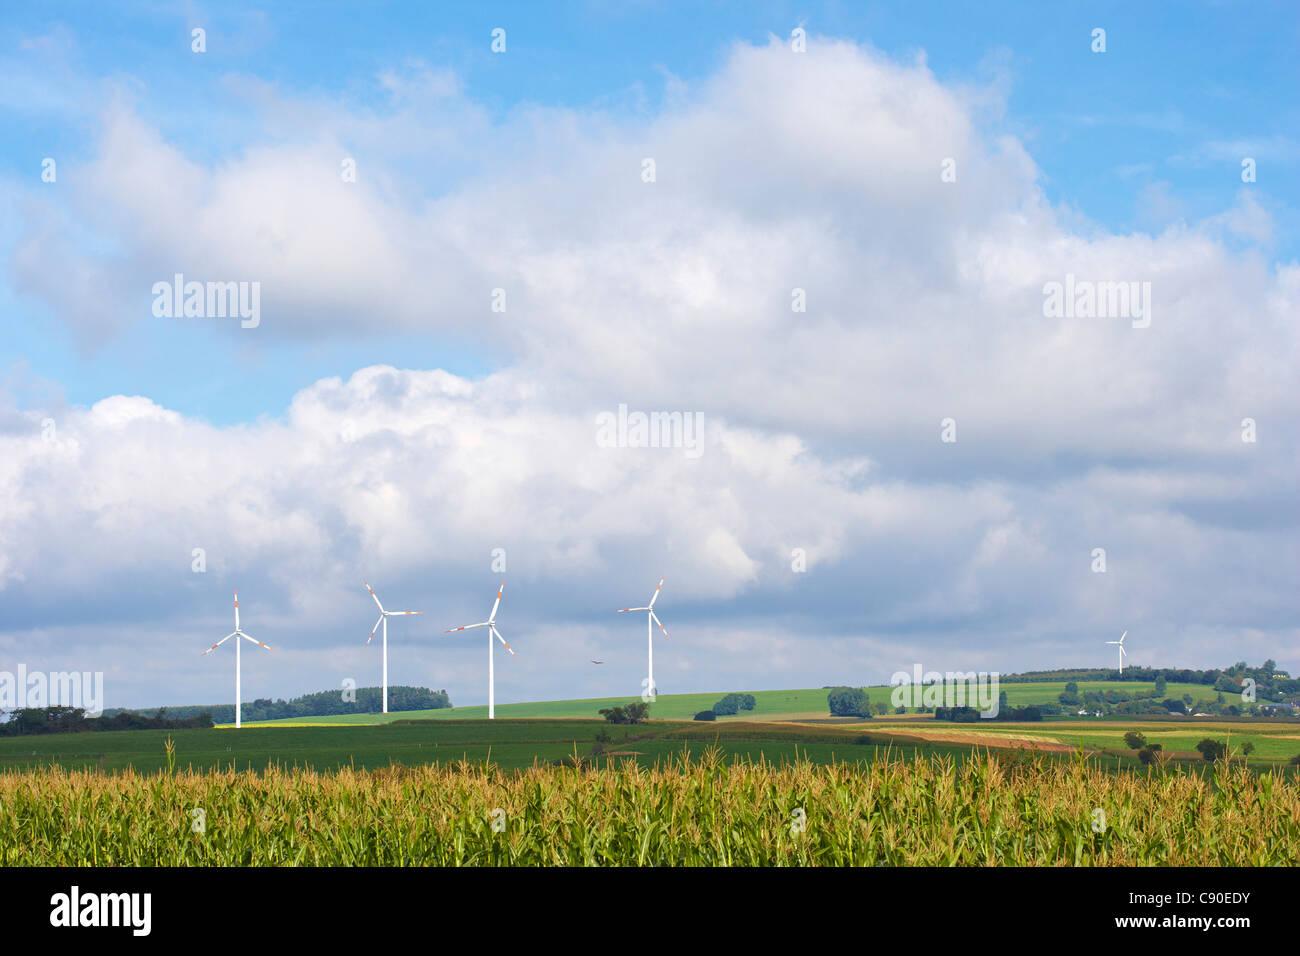 Energia di Vento vicino Seinsfeld, Eifel, Renania-Palatinato, Germania, Europa Immagini Stock